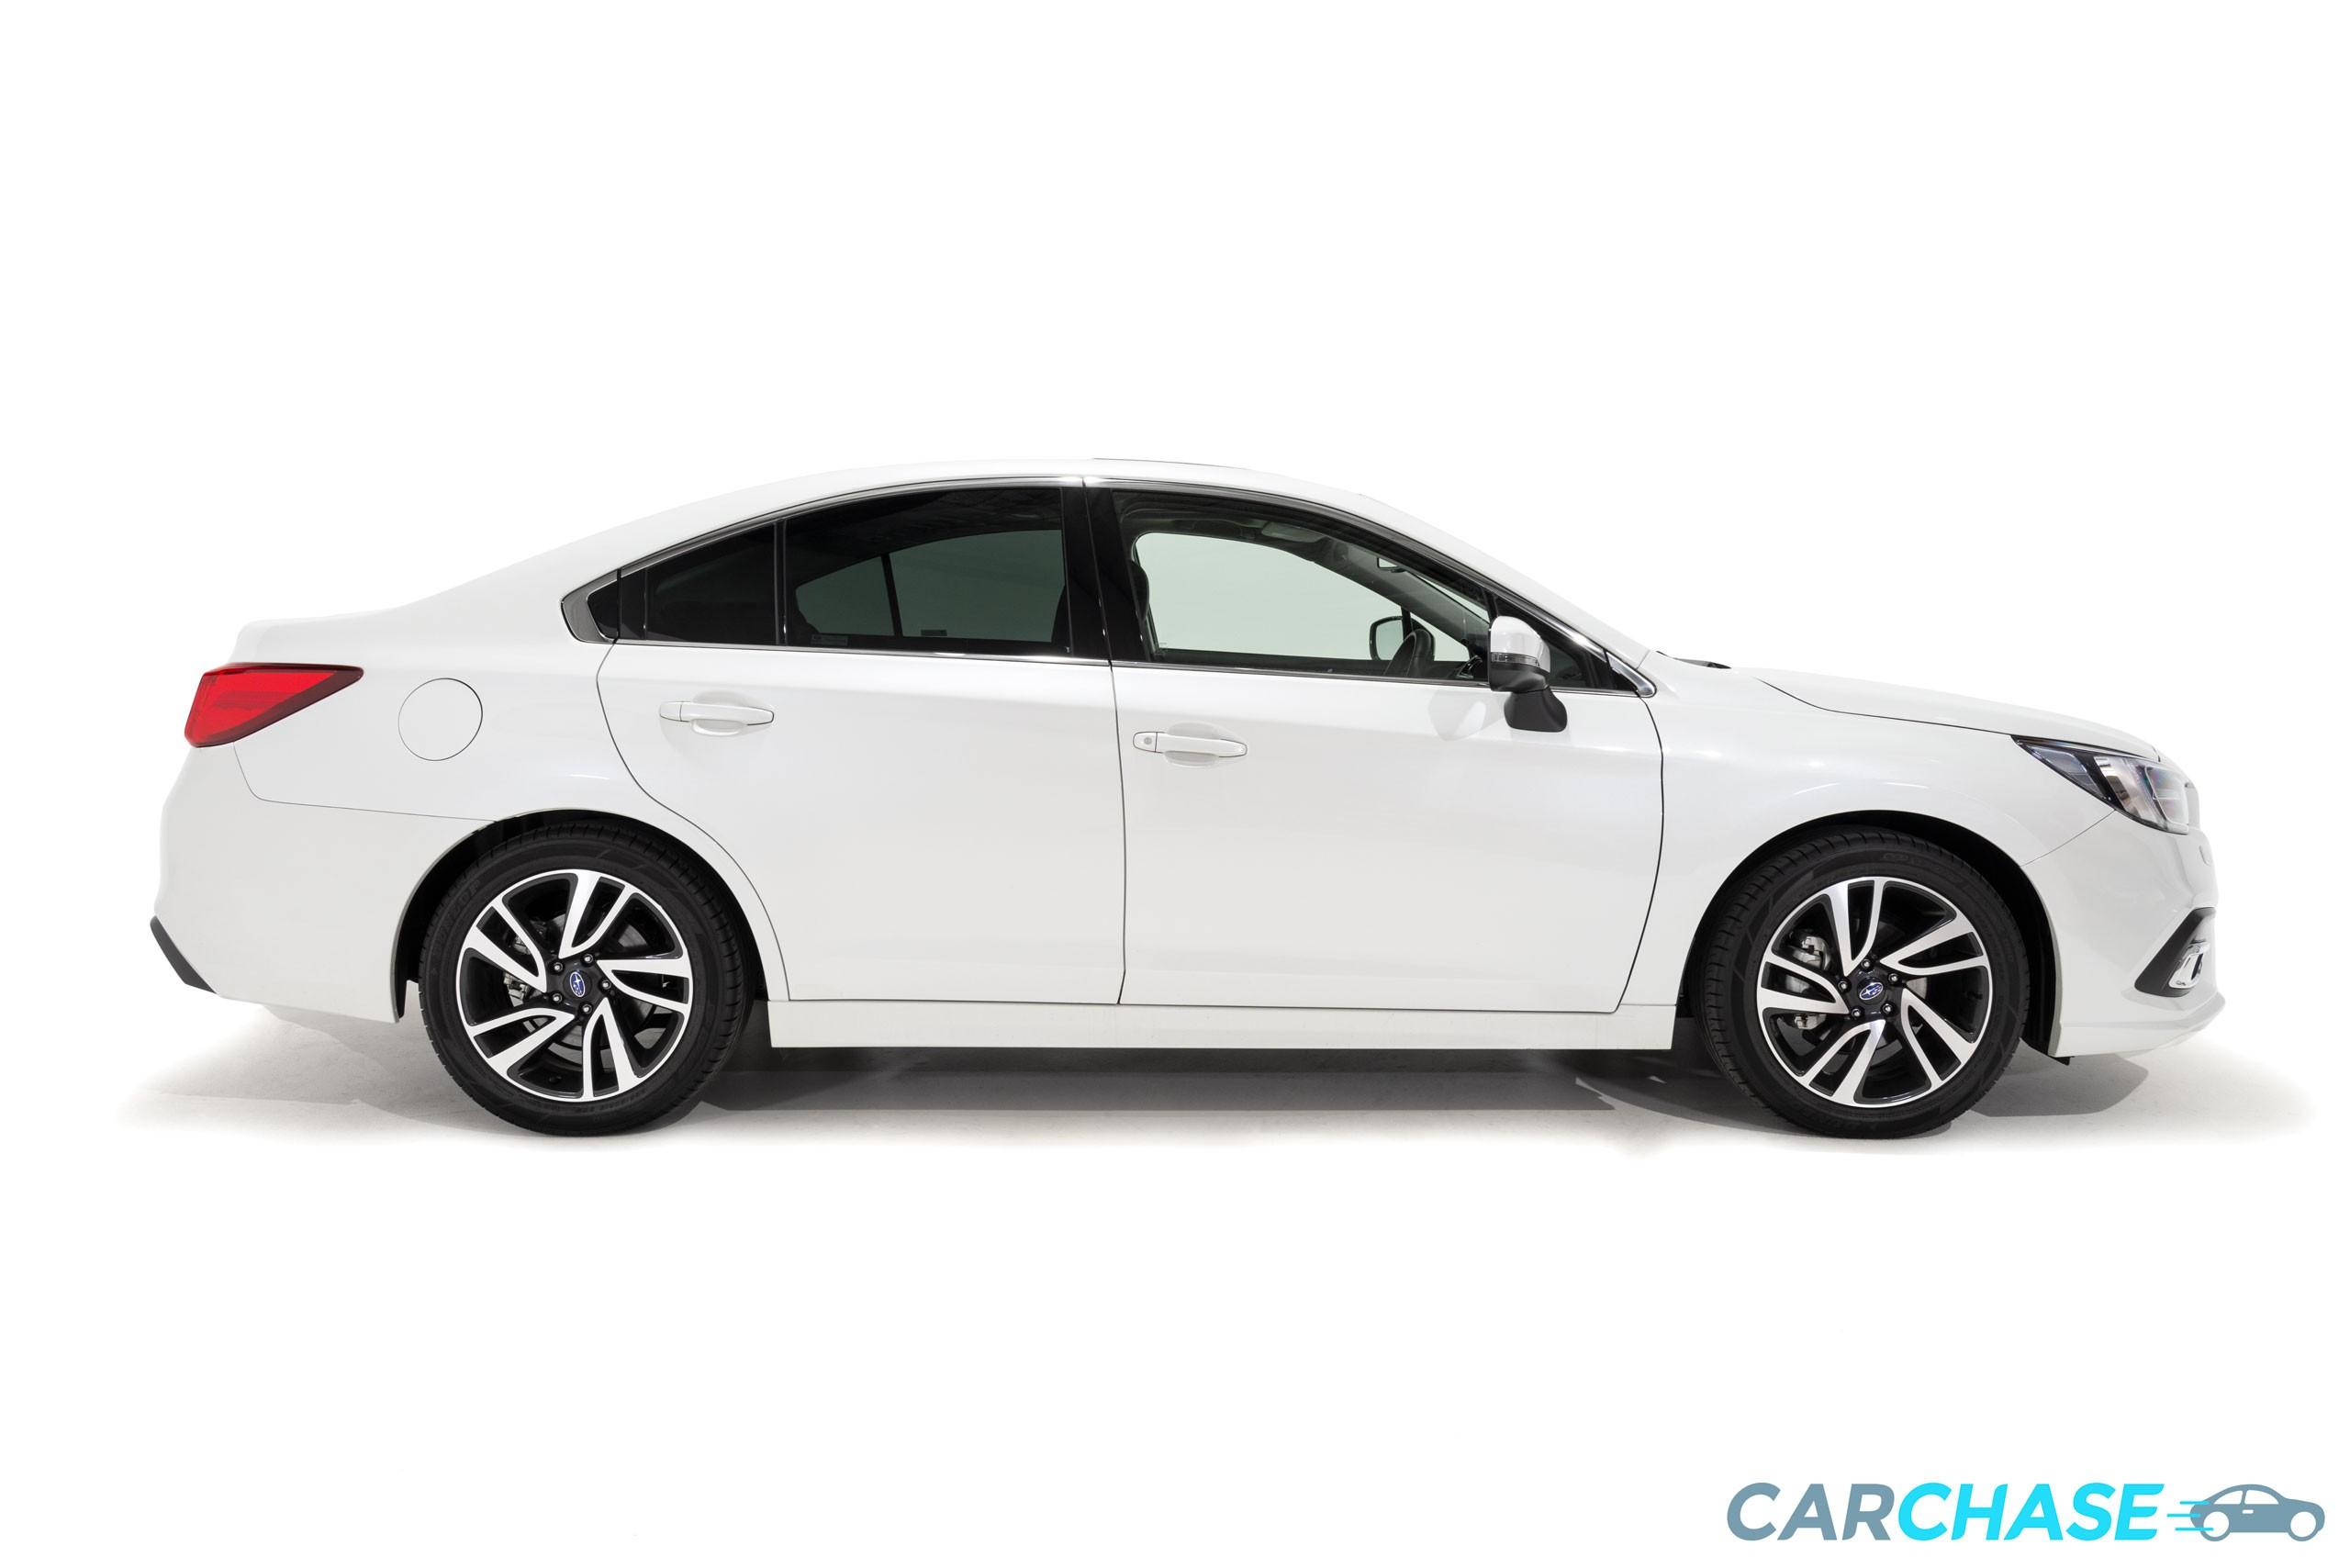 Image of right profile of 2018 Subaru Liberty 2.5i Premium